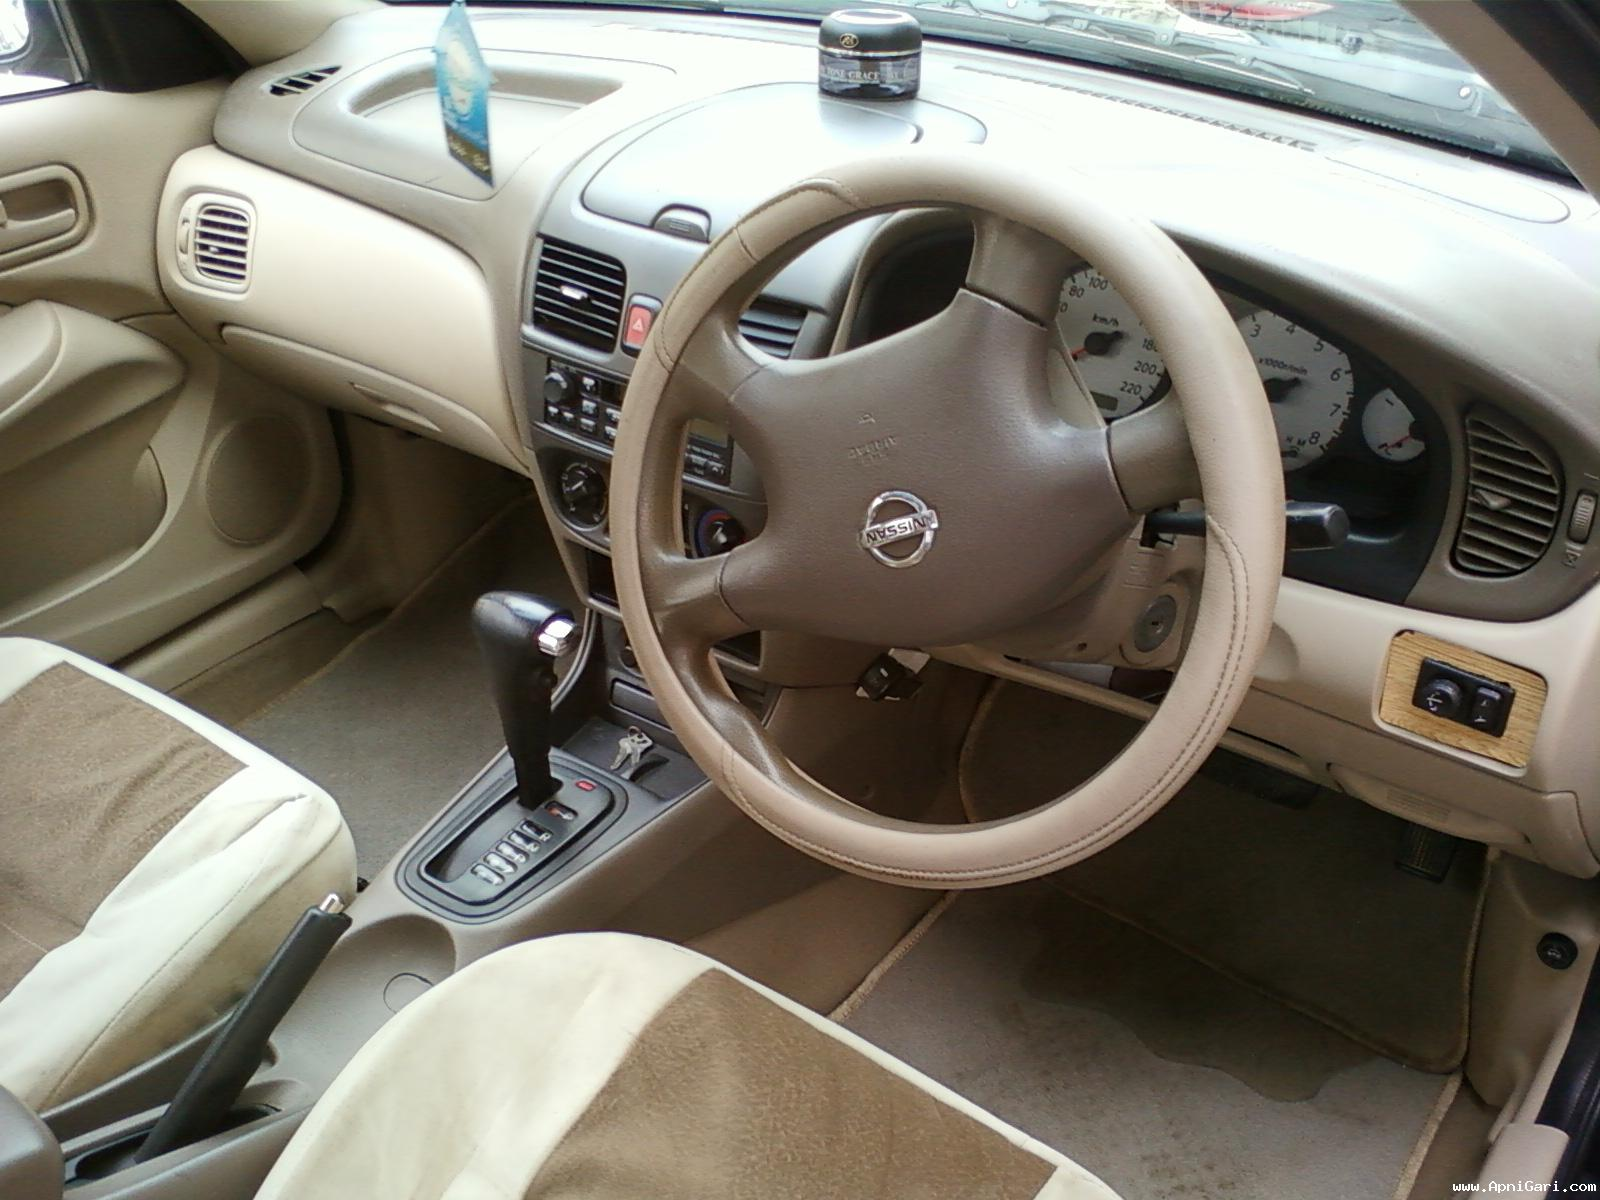 Nissan Sunny EX Saloon Automatic 1.3 in Pakistan, Sunny ...